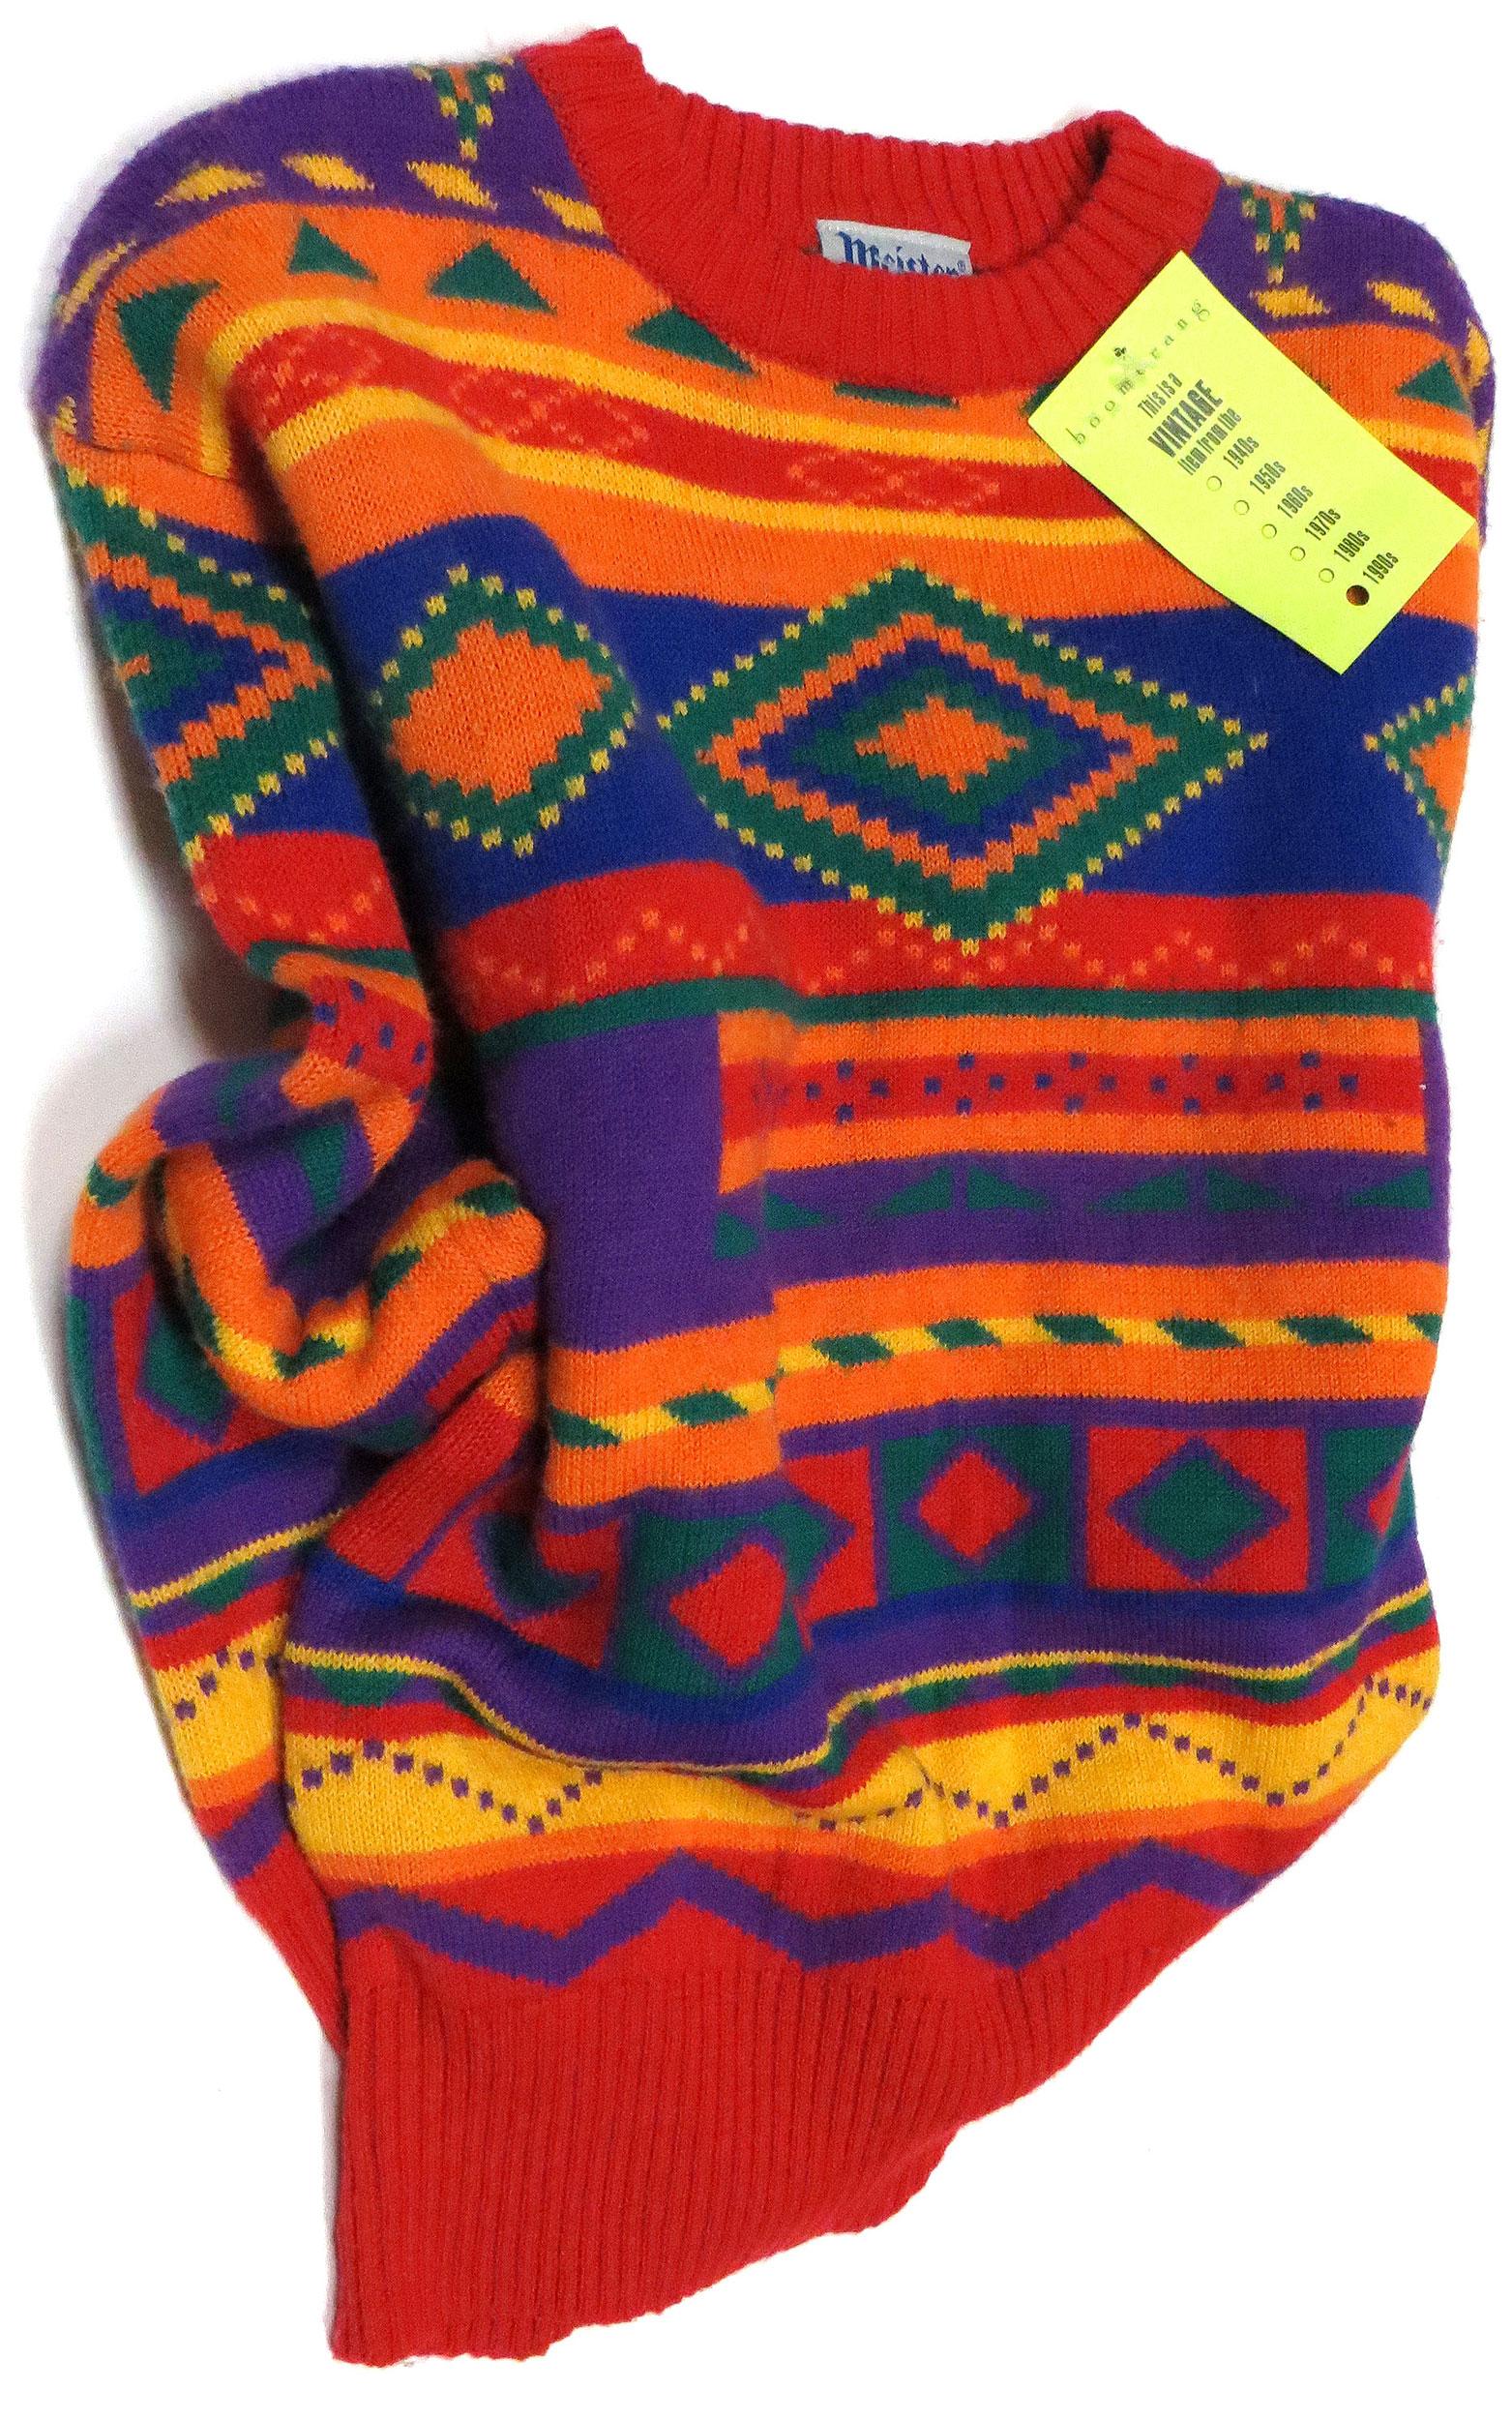 8dbe80899f148 Vintage  80s Ski Sweater